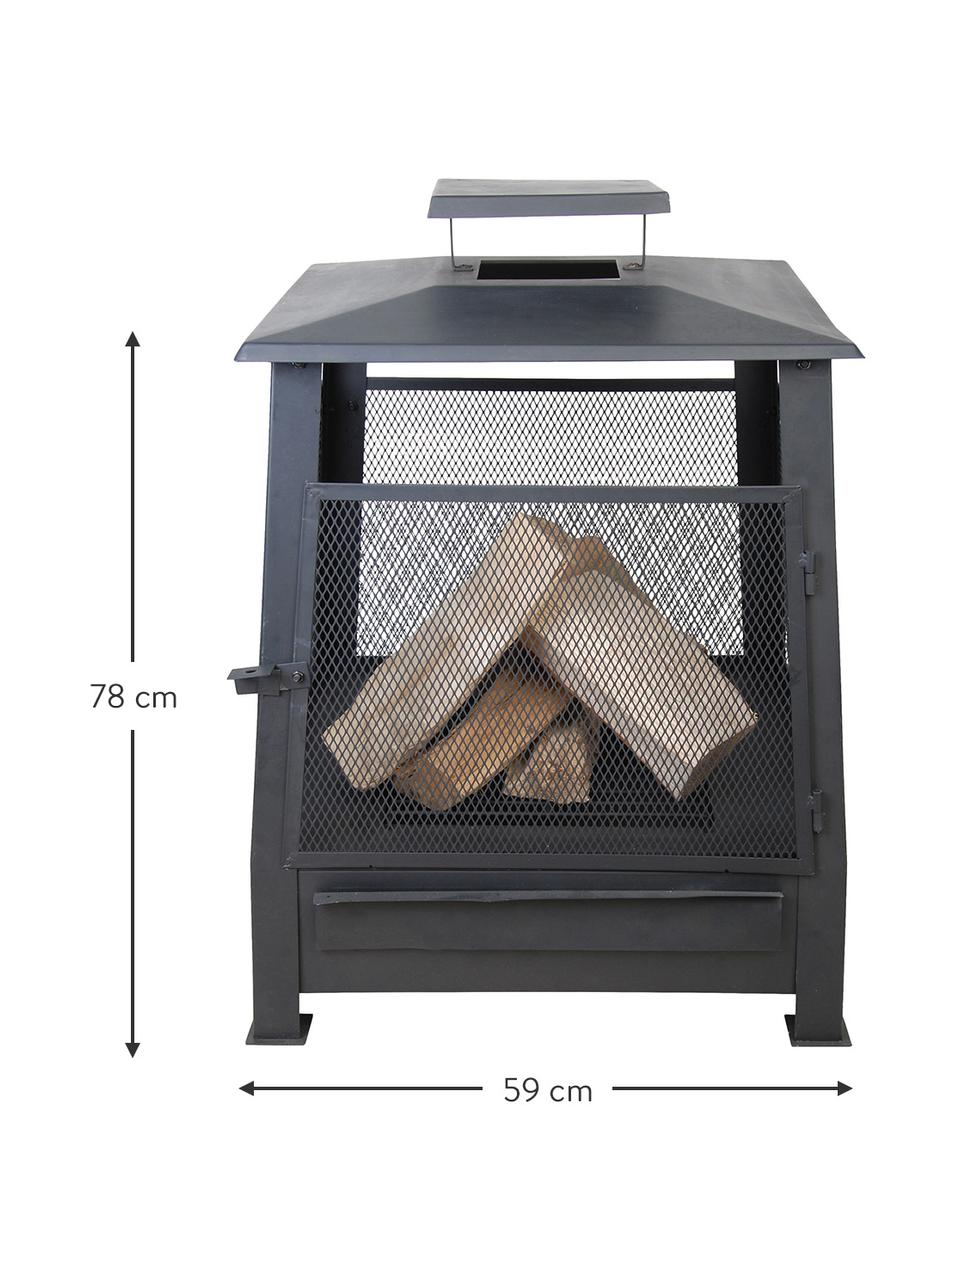 Terrassen-Ofen Pagode, Metall, beschichtet, Schwarz, 59 x 78 cm